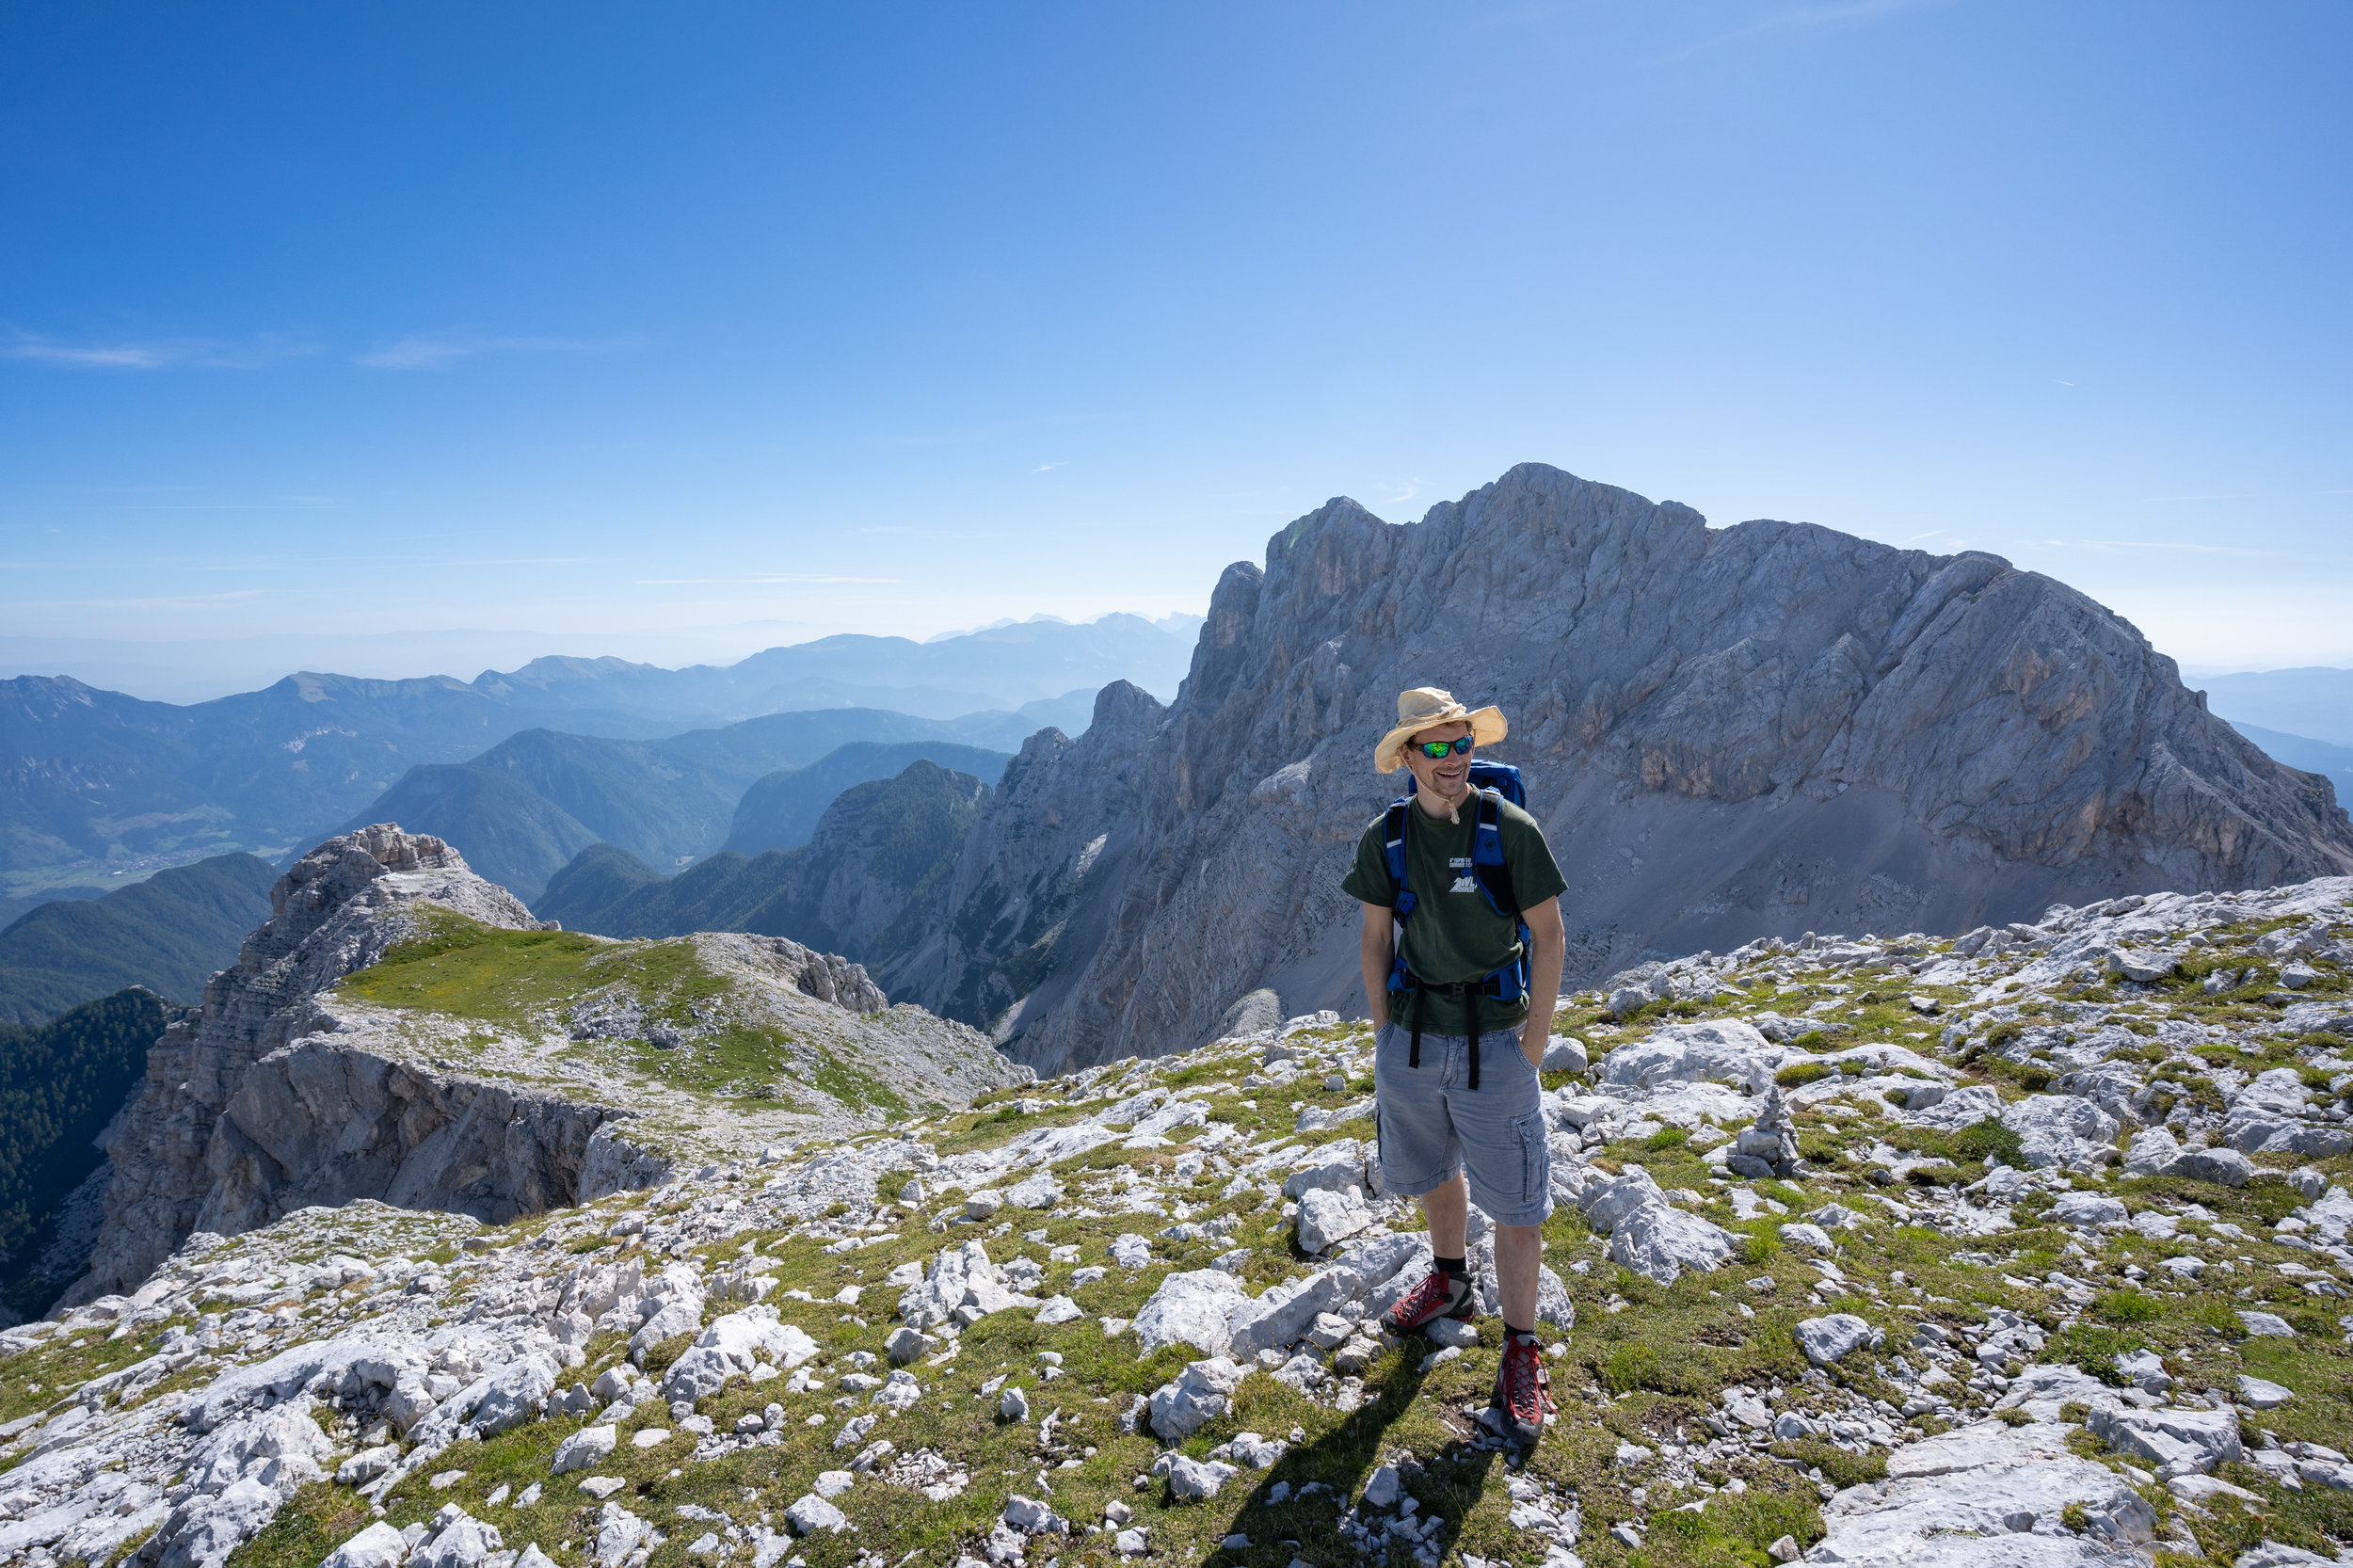 Going down, but not directly. This is the ridge of Mt. Visoka Vrbanova špica.